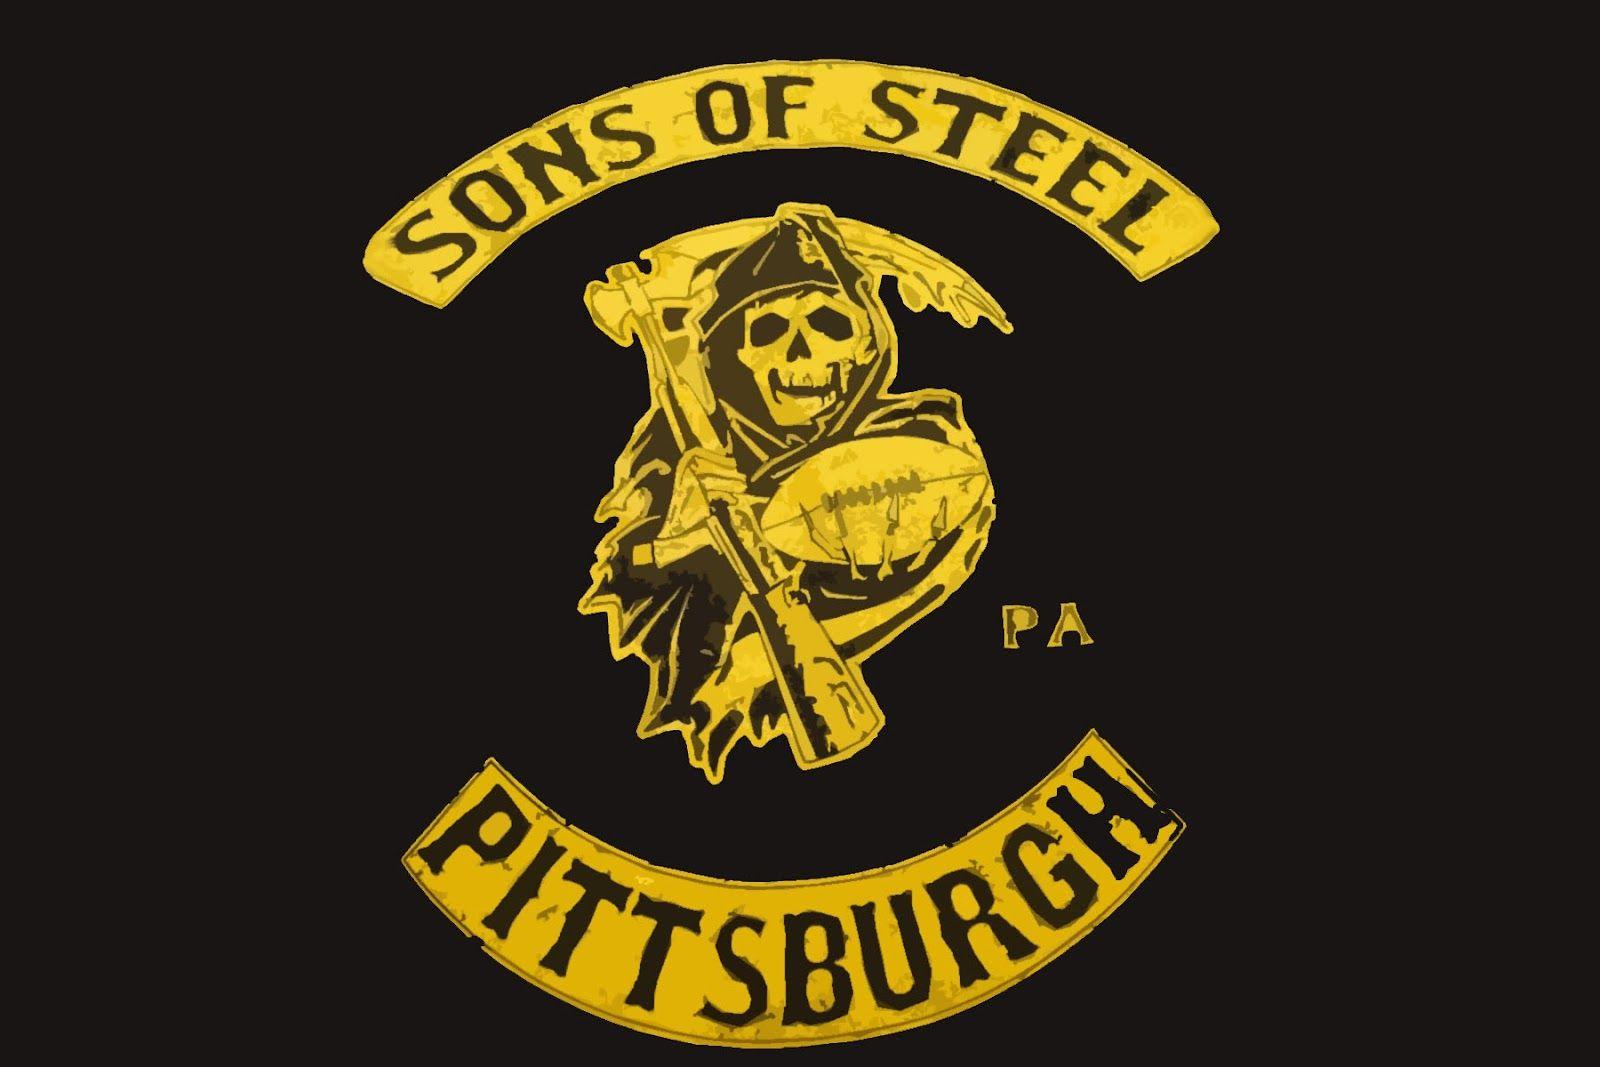 pittsburgh steelers team logo  8ef6a142e